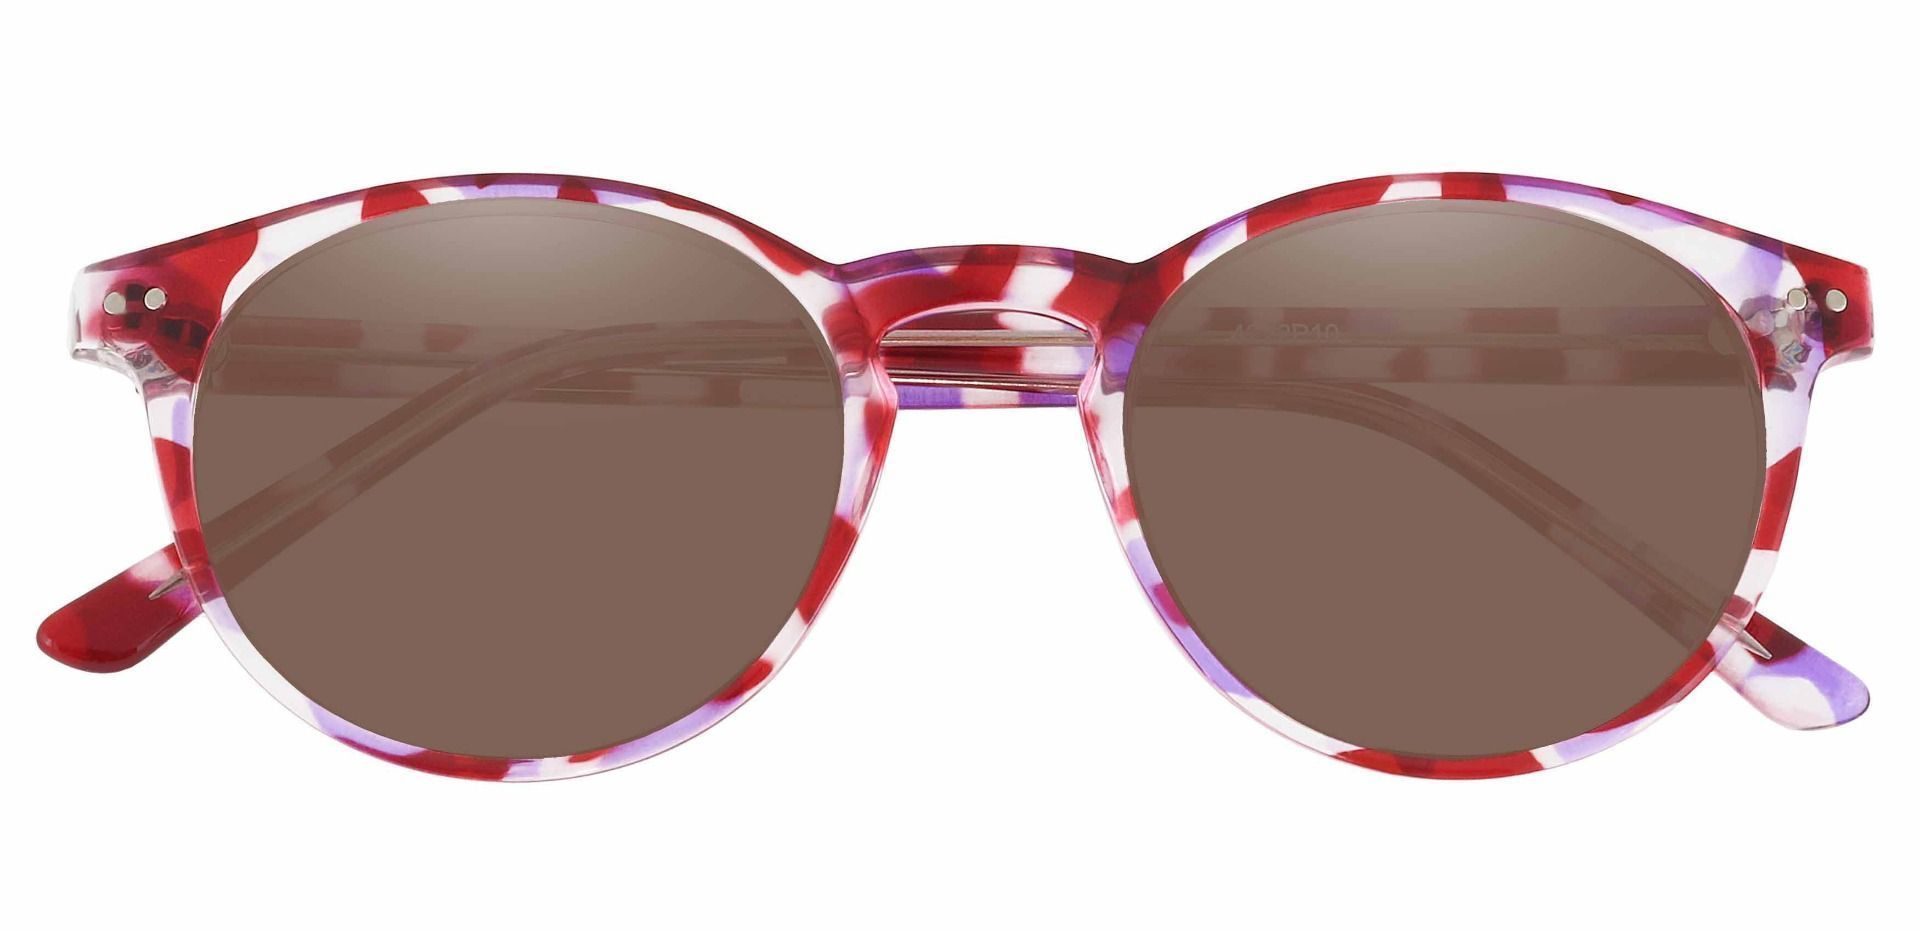 Harmony Oval Prescription Sunglasses - Purple Frame With Brown Lenses